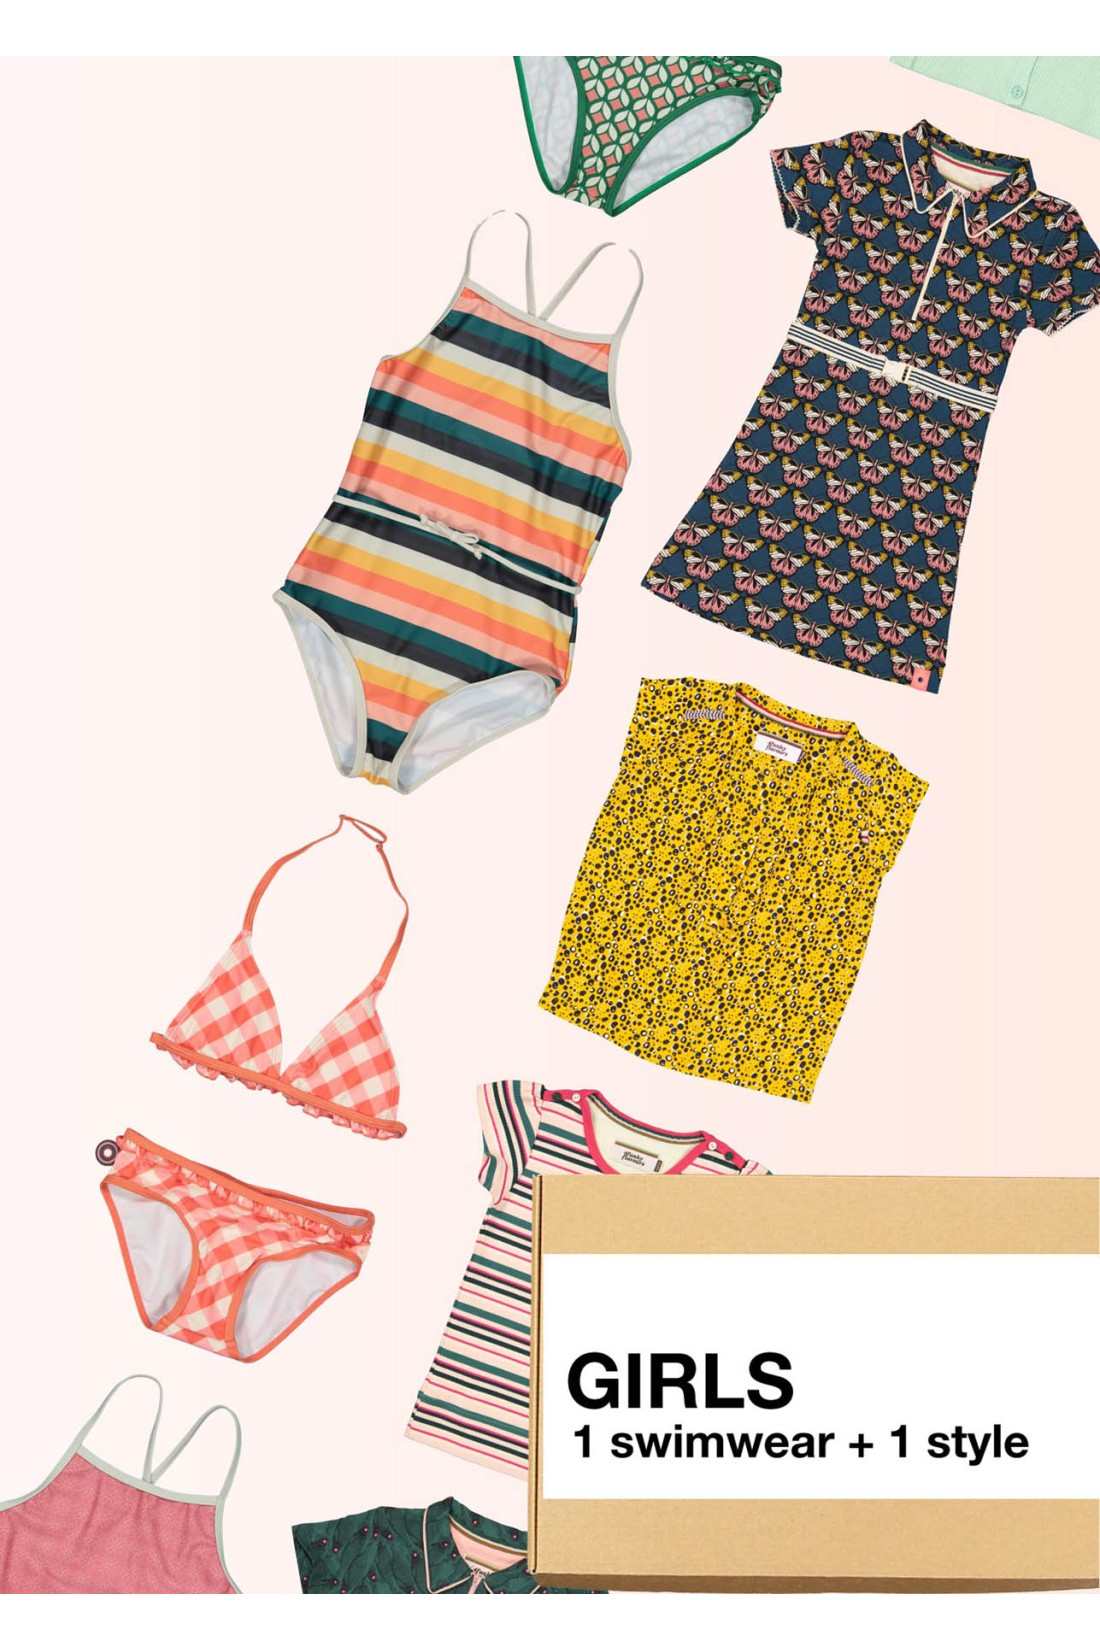 Surprise Box Girl - Summer Holiday Box - Swimwear + Extra Style